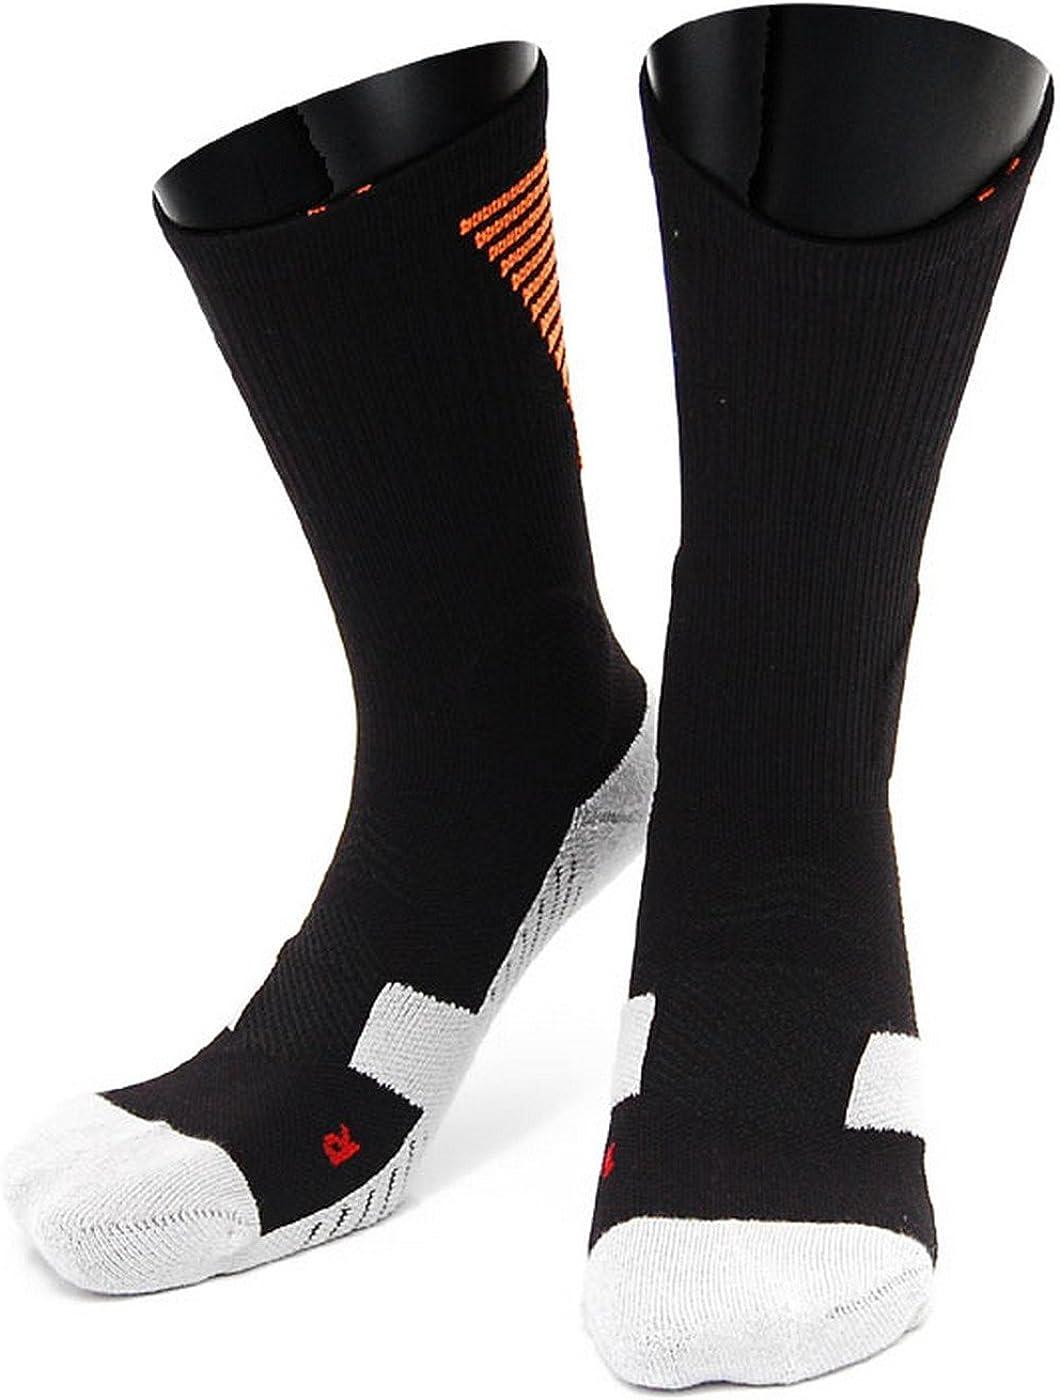 Lovely Annie Big Girl's 1 Pair High Crew Athletic Sports Socks Size L/XL XL0028-07(Black w/Orange Strip)